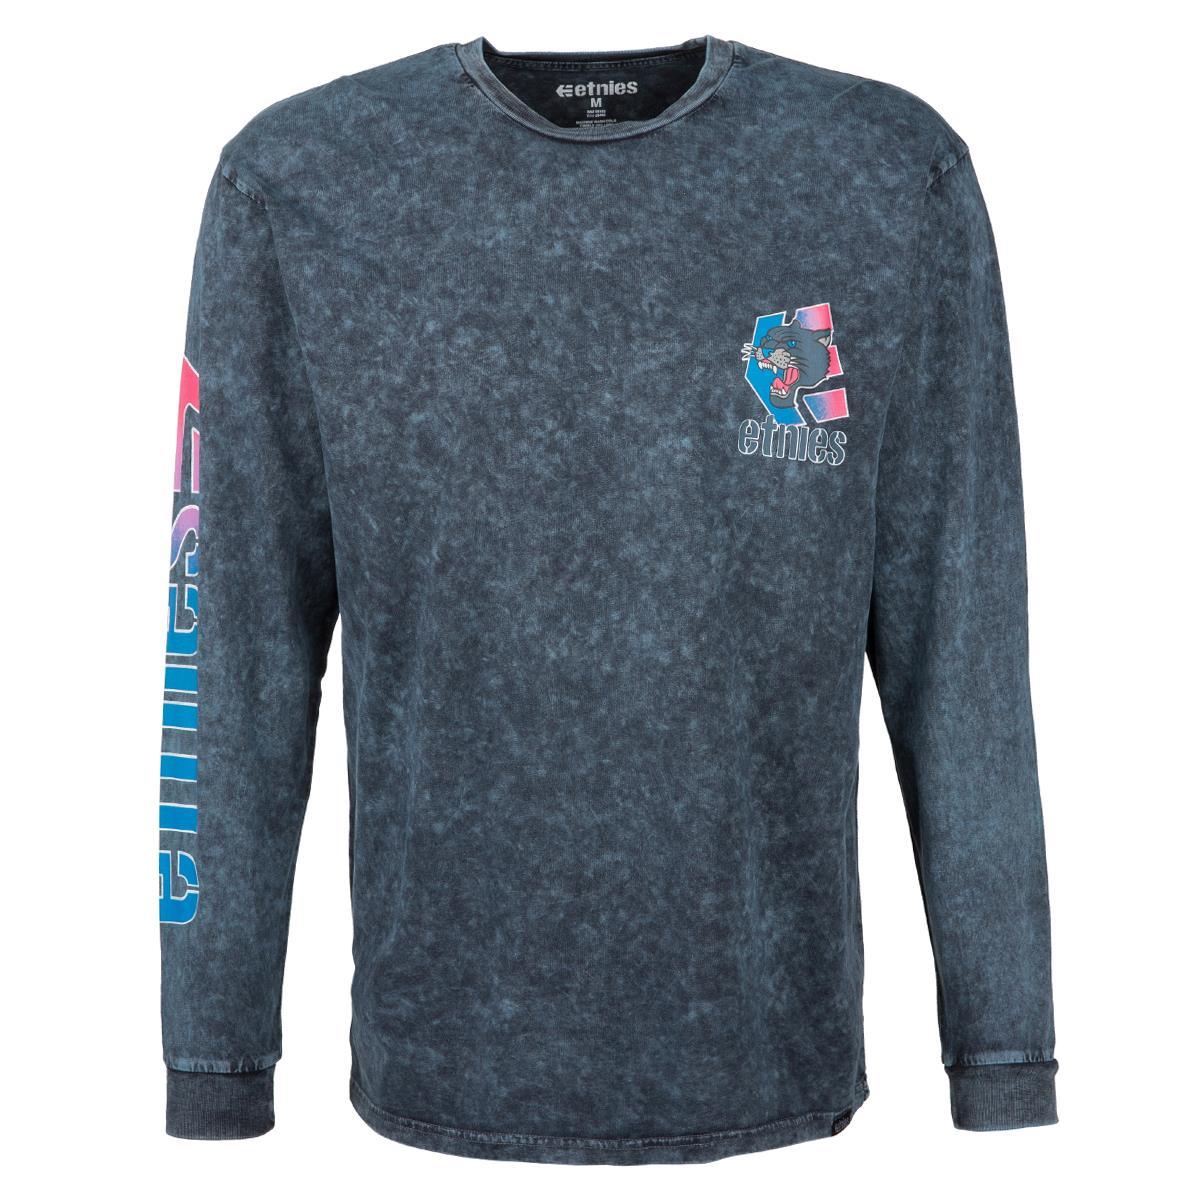 Etnies T-Shirt Retro Ls Indigo